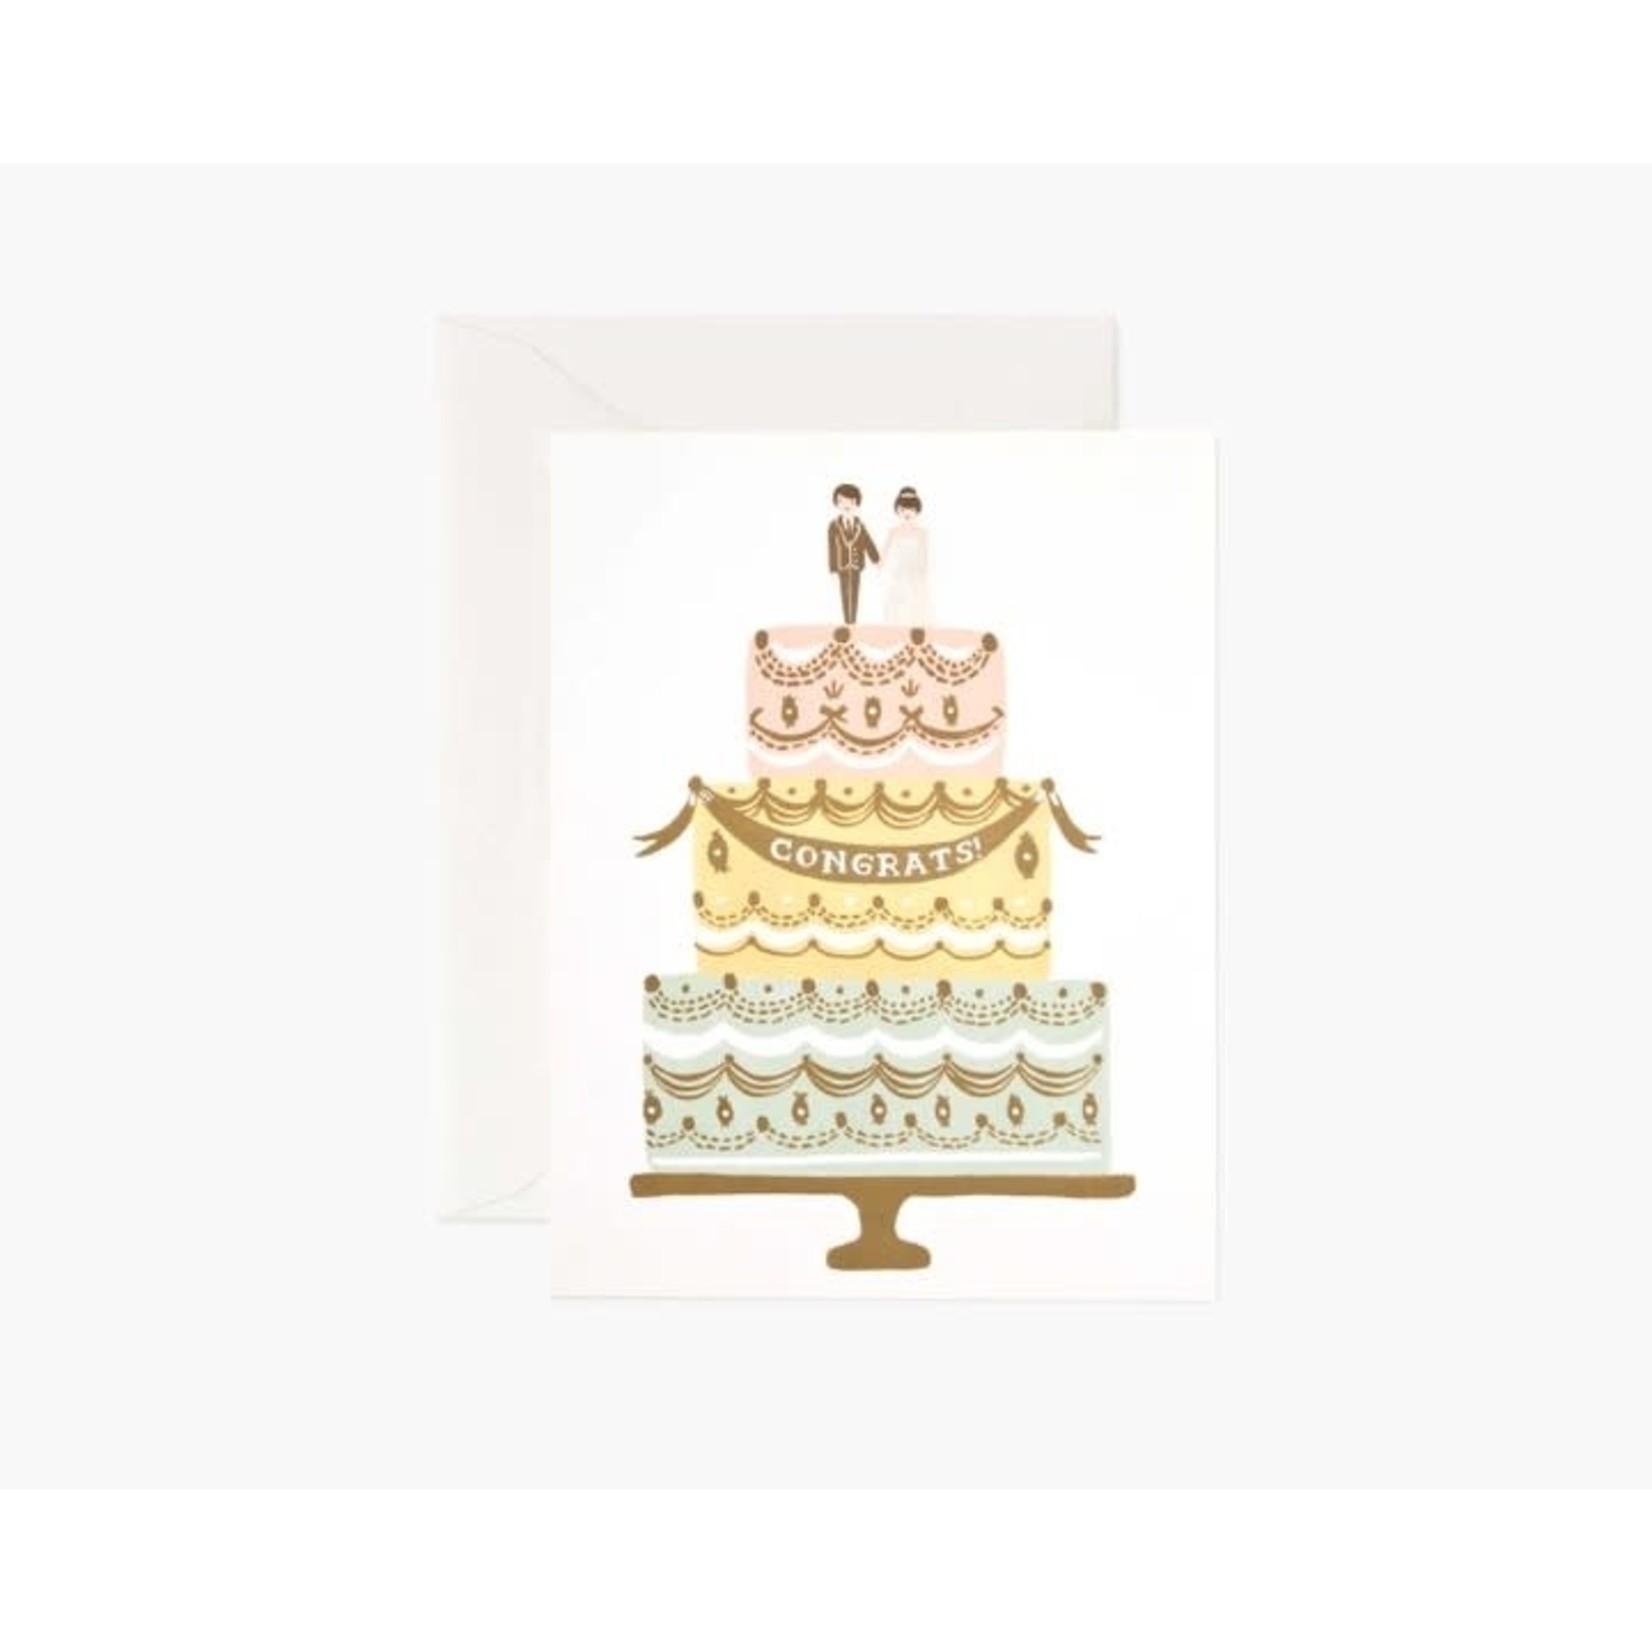 Rifle Paper Co. Congrats Wedding Cake